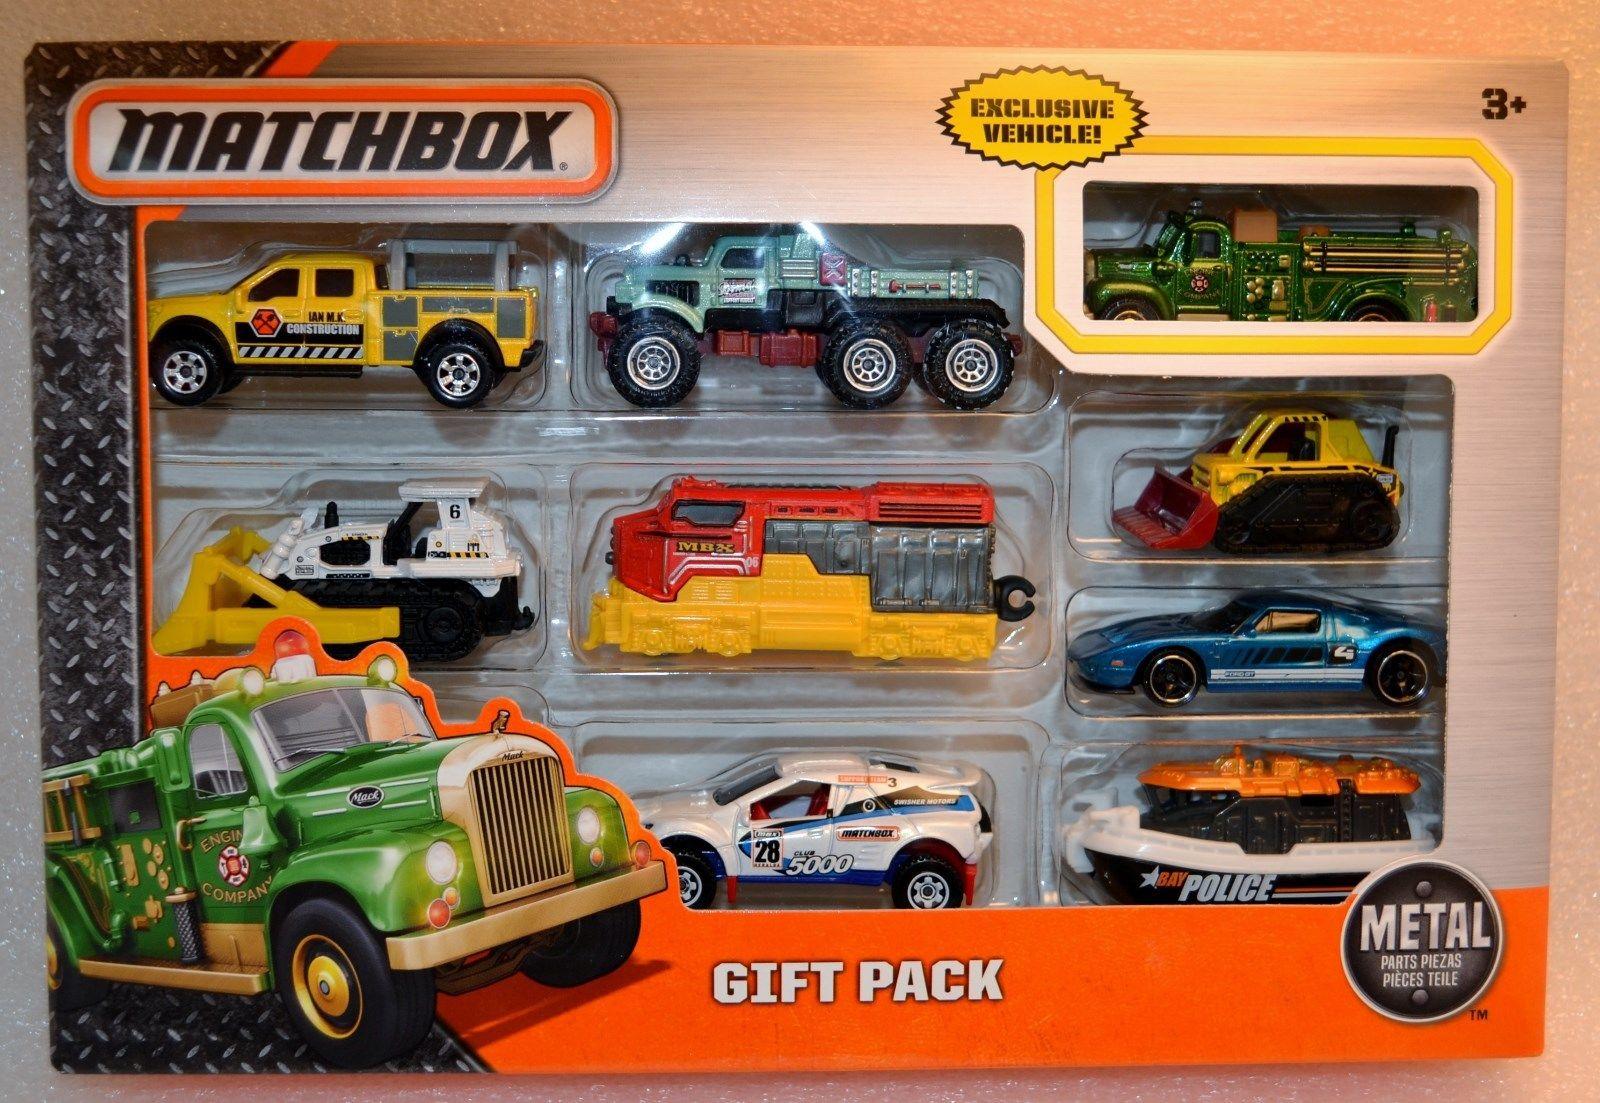 Segrave Fire Truck.jpg   Matchbox Cars Wiki   Fandom powered by Wikia ...